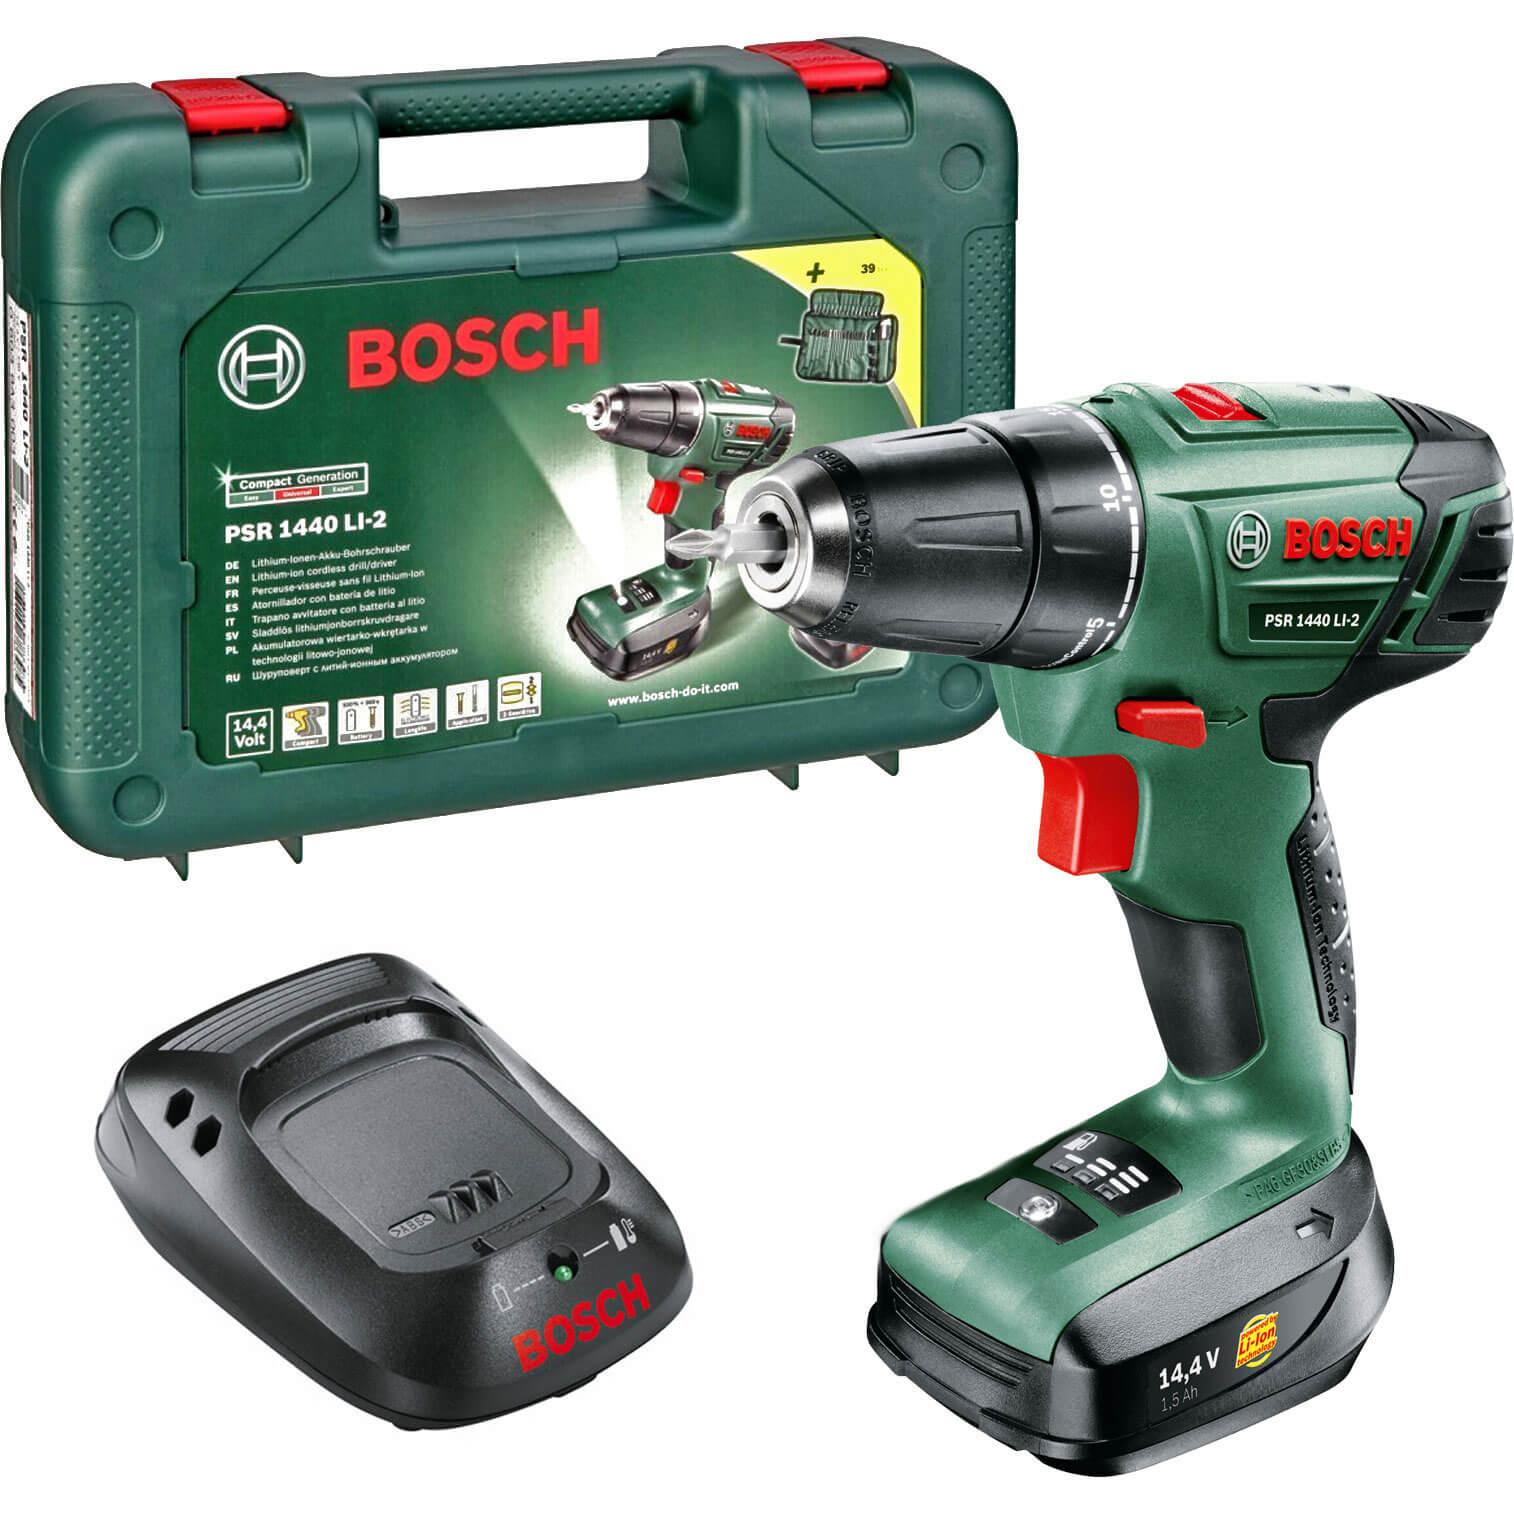 bosch gsr 1440 li cordless drill driver with 2 li ion batteries. Black Bedroom Furniture Sets. Home Design Ideas